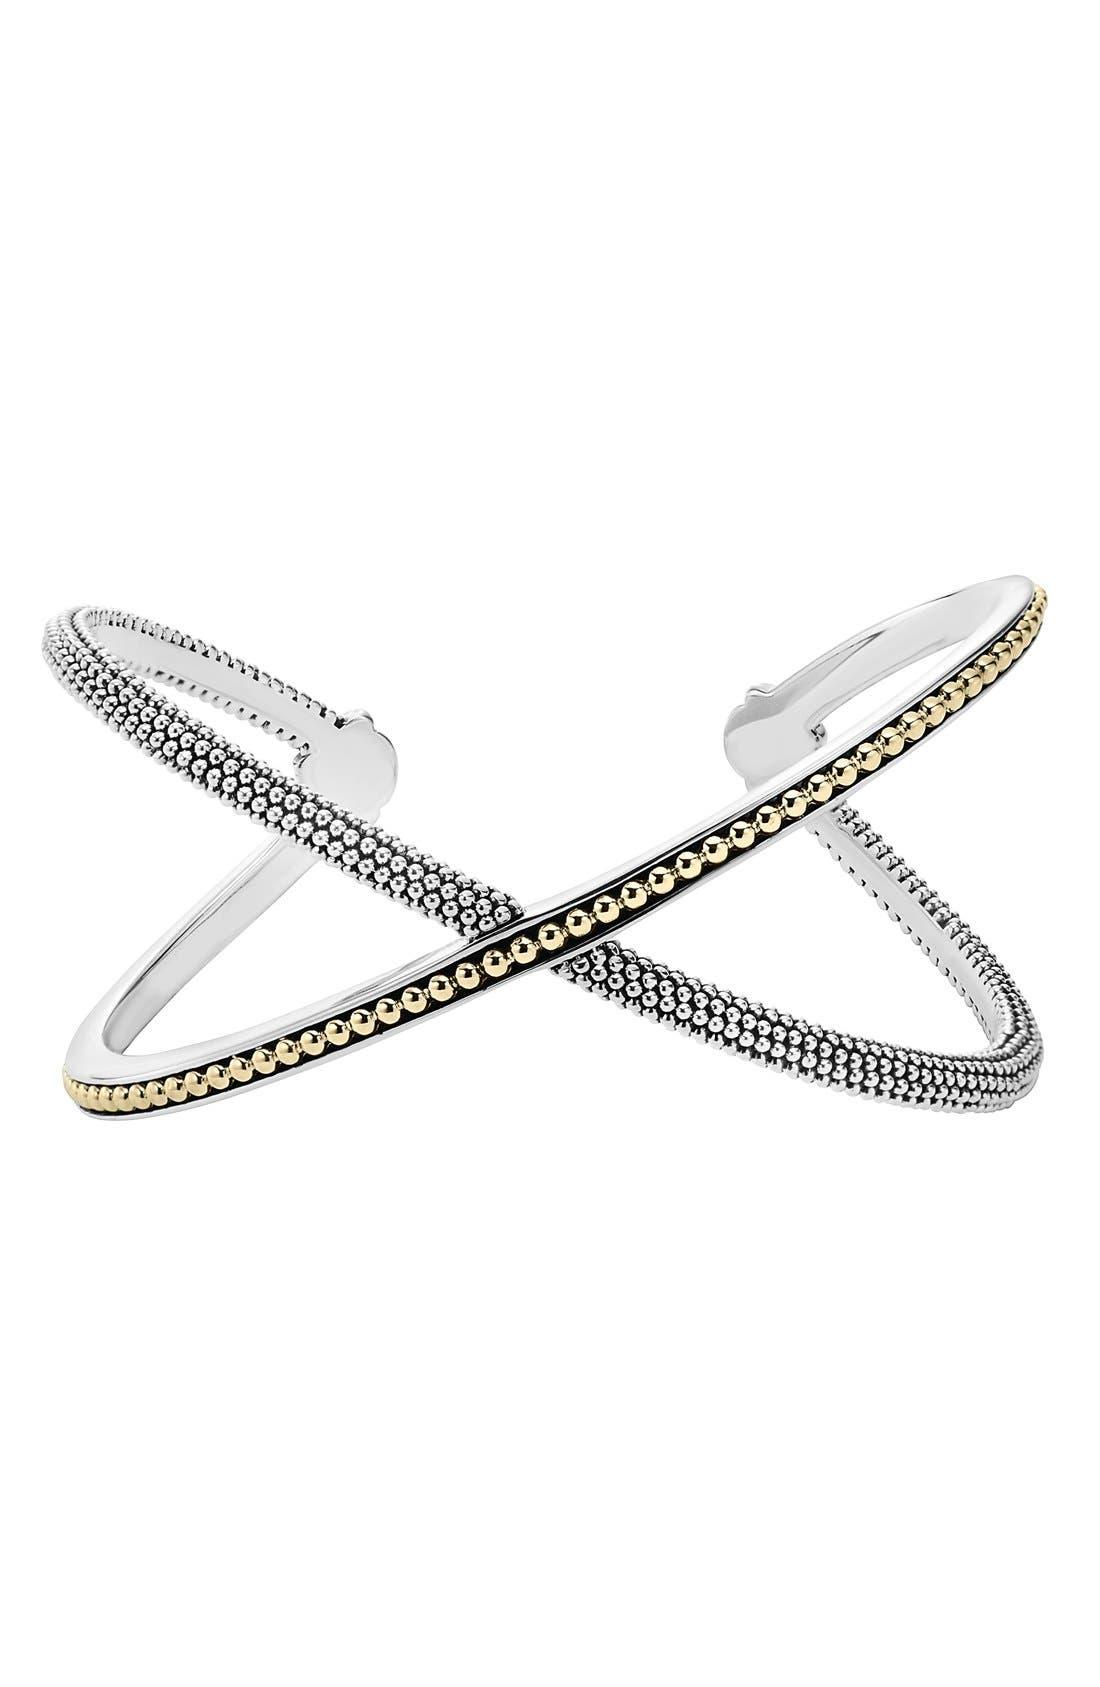 Alternate Image 1 Selected - LAGOS Infinity Cuff Bracelet